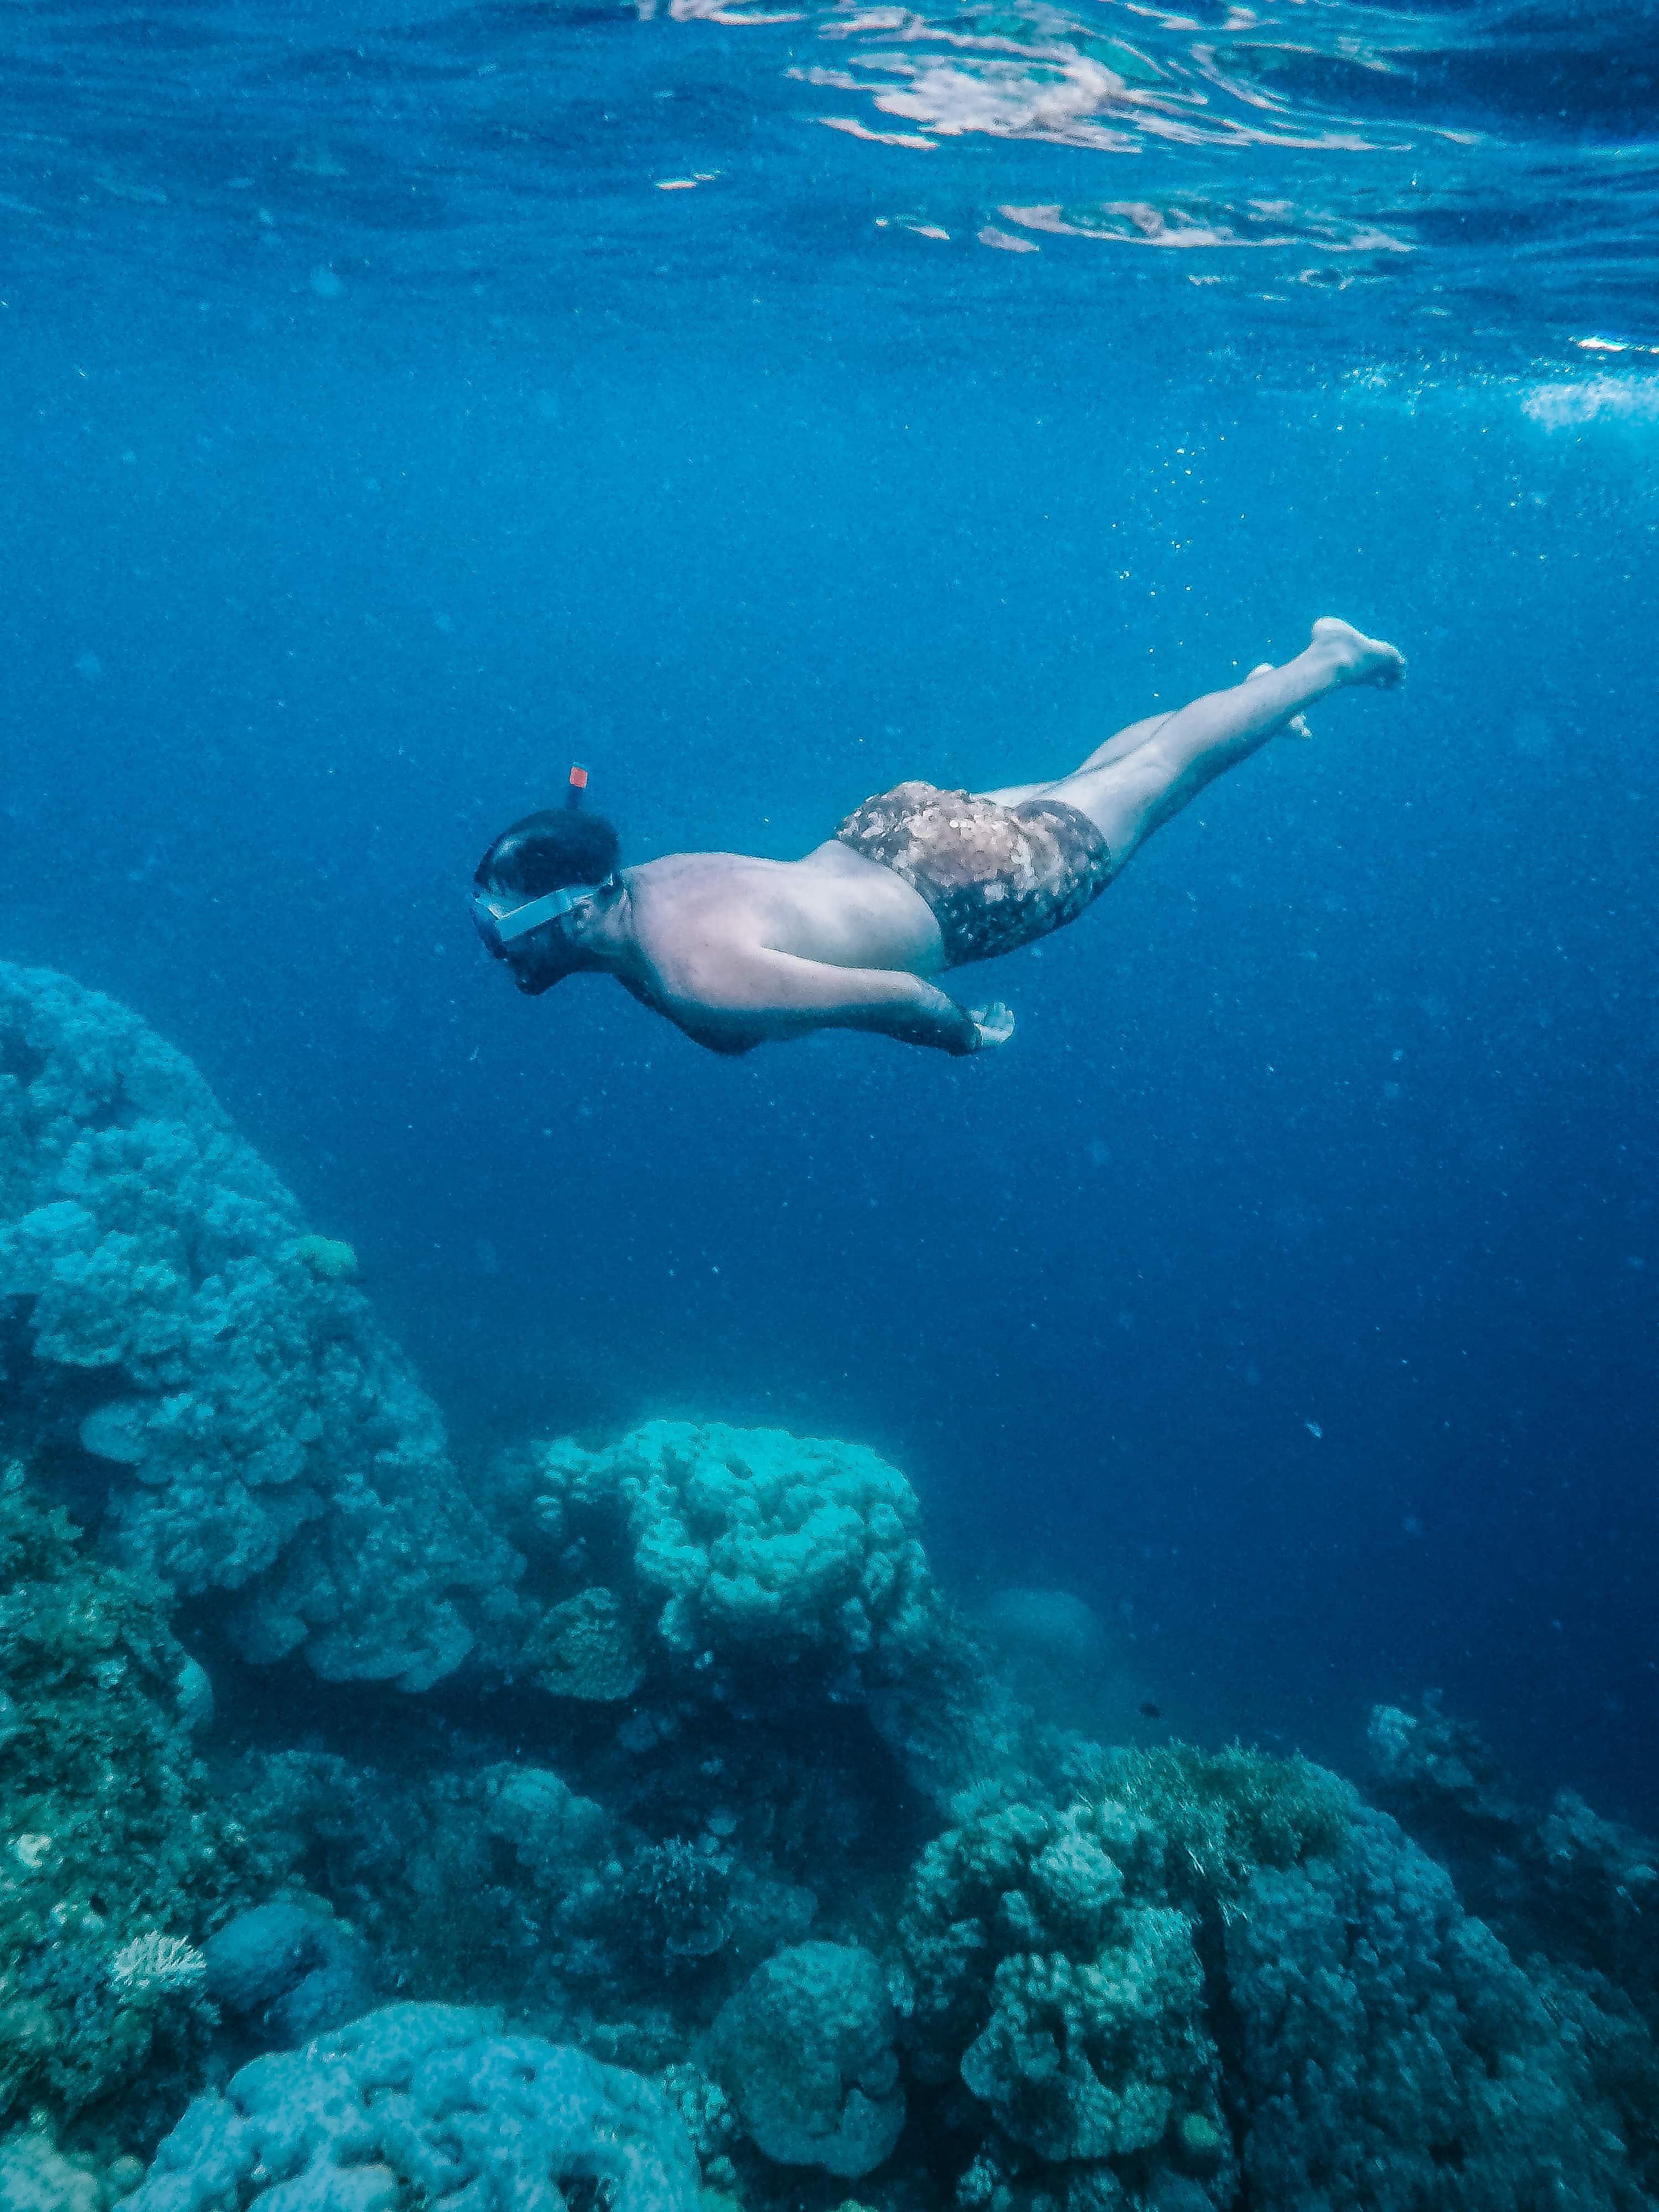 Siete Pecados, budget things to do in Australia, snorkeling